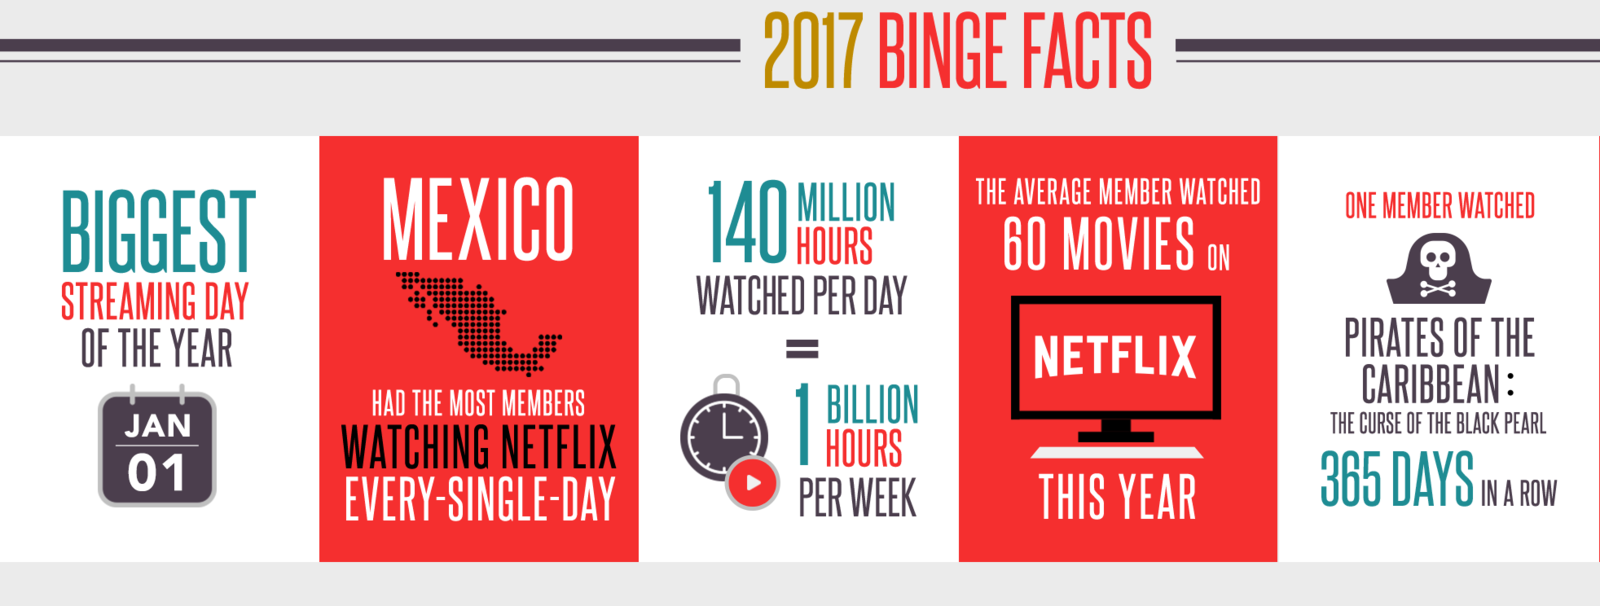 Buzzfeed dating site statistics